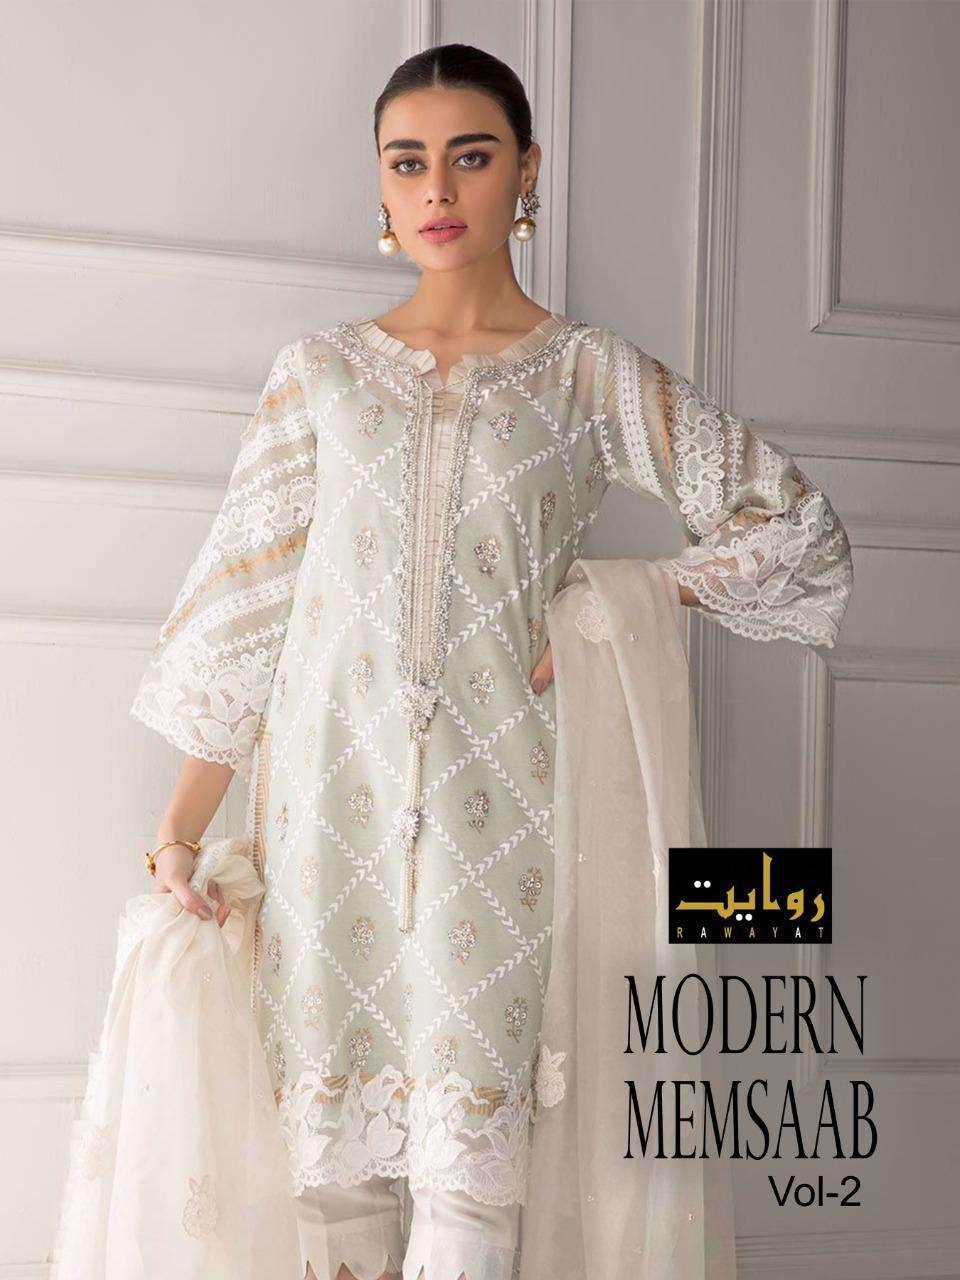 Rawayat fashion Modern Memsaab Vol 2 Jam Cotton With Embroidery Work Pakistani Suits Collection